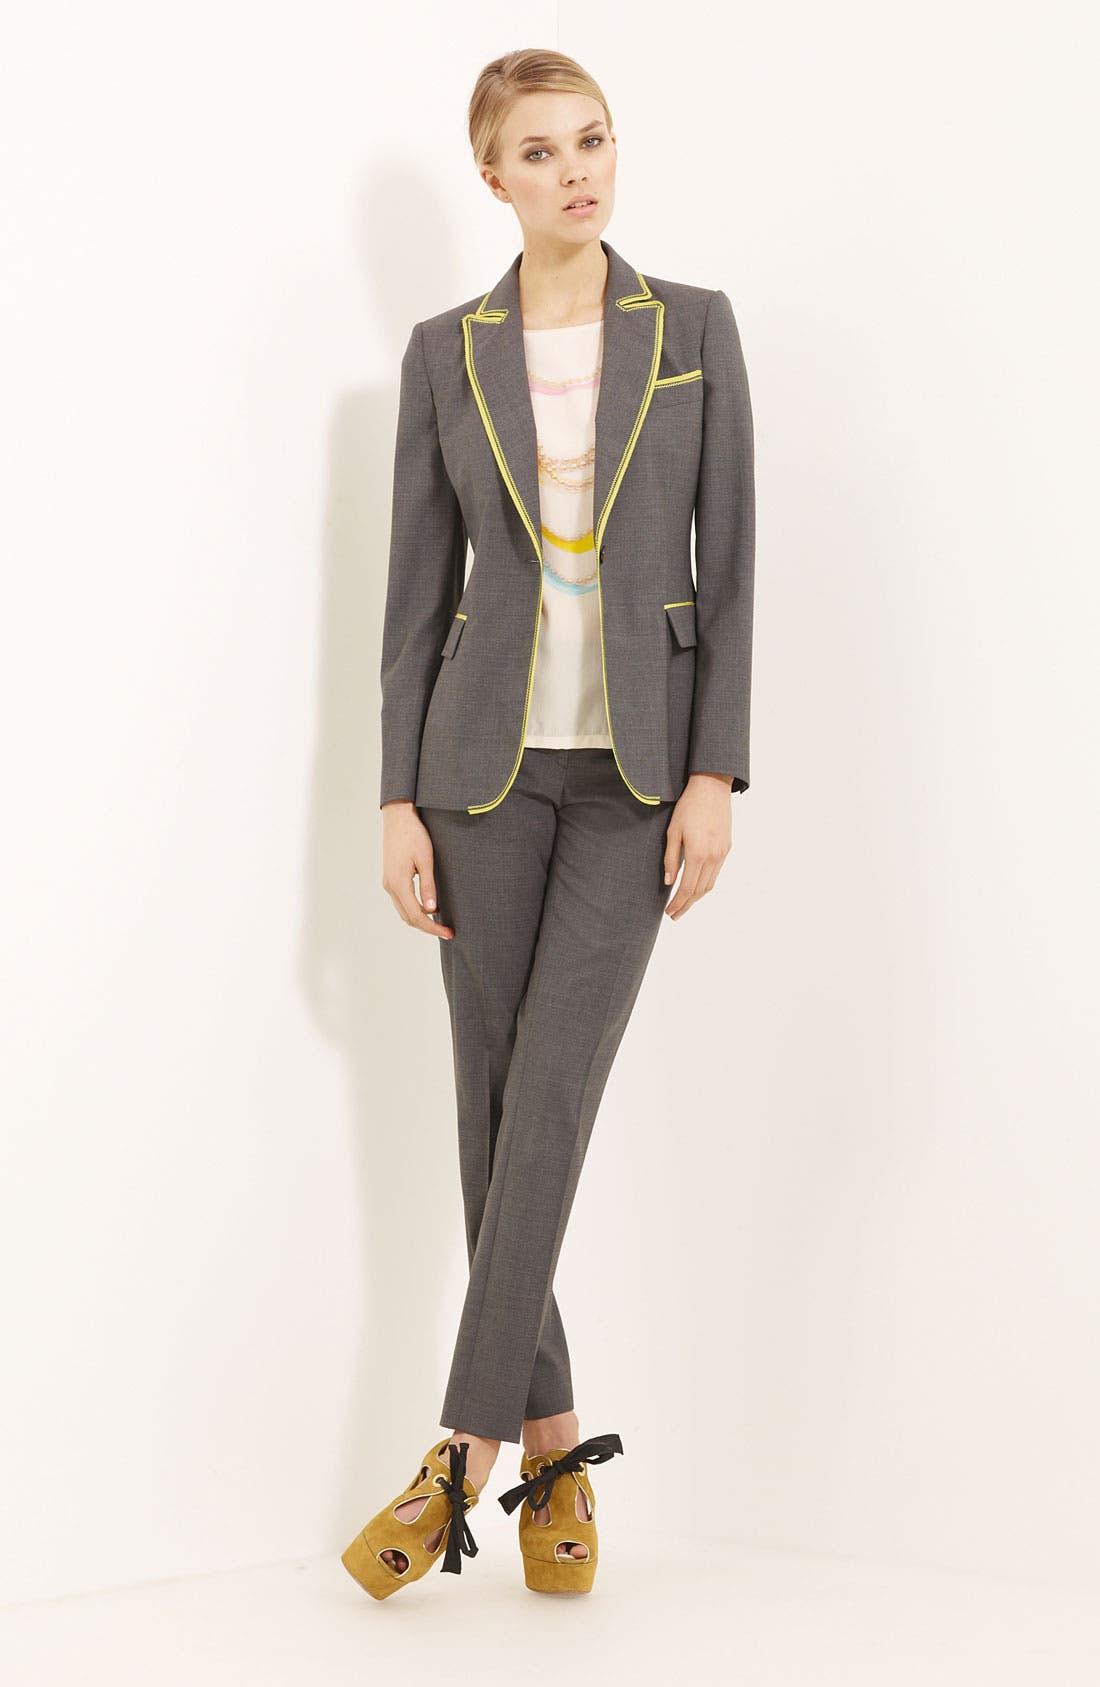 Main Image - Moschino Cheap & Chic Jacket & Trousers